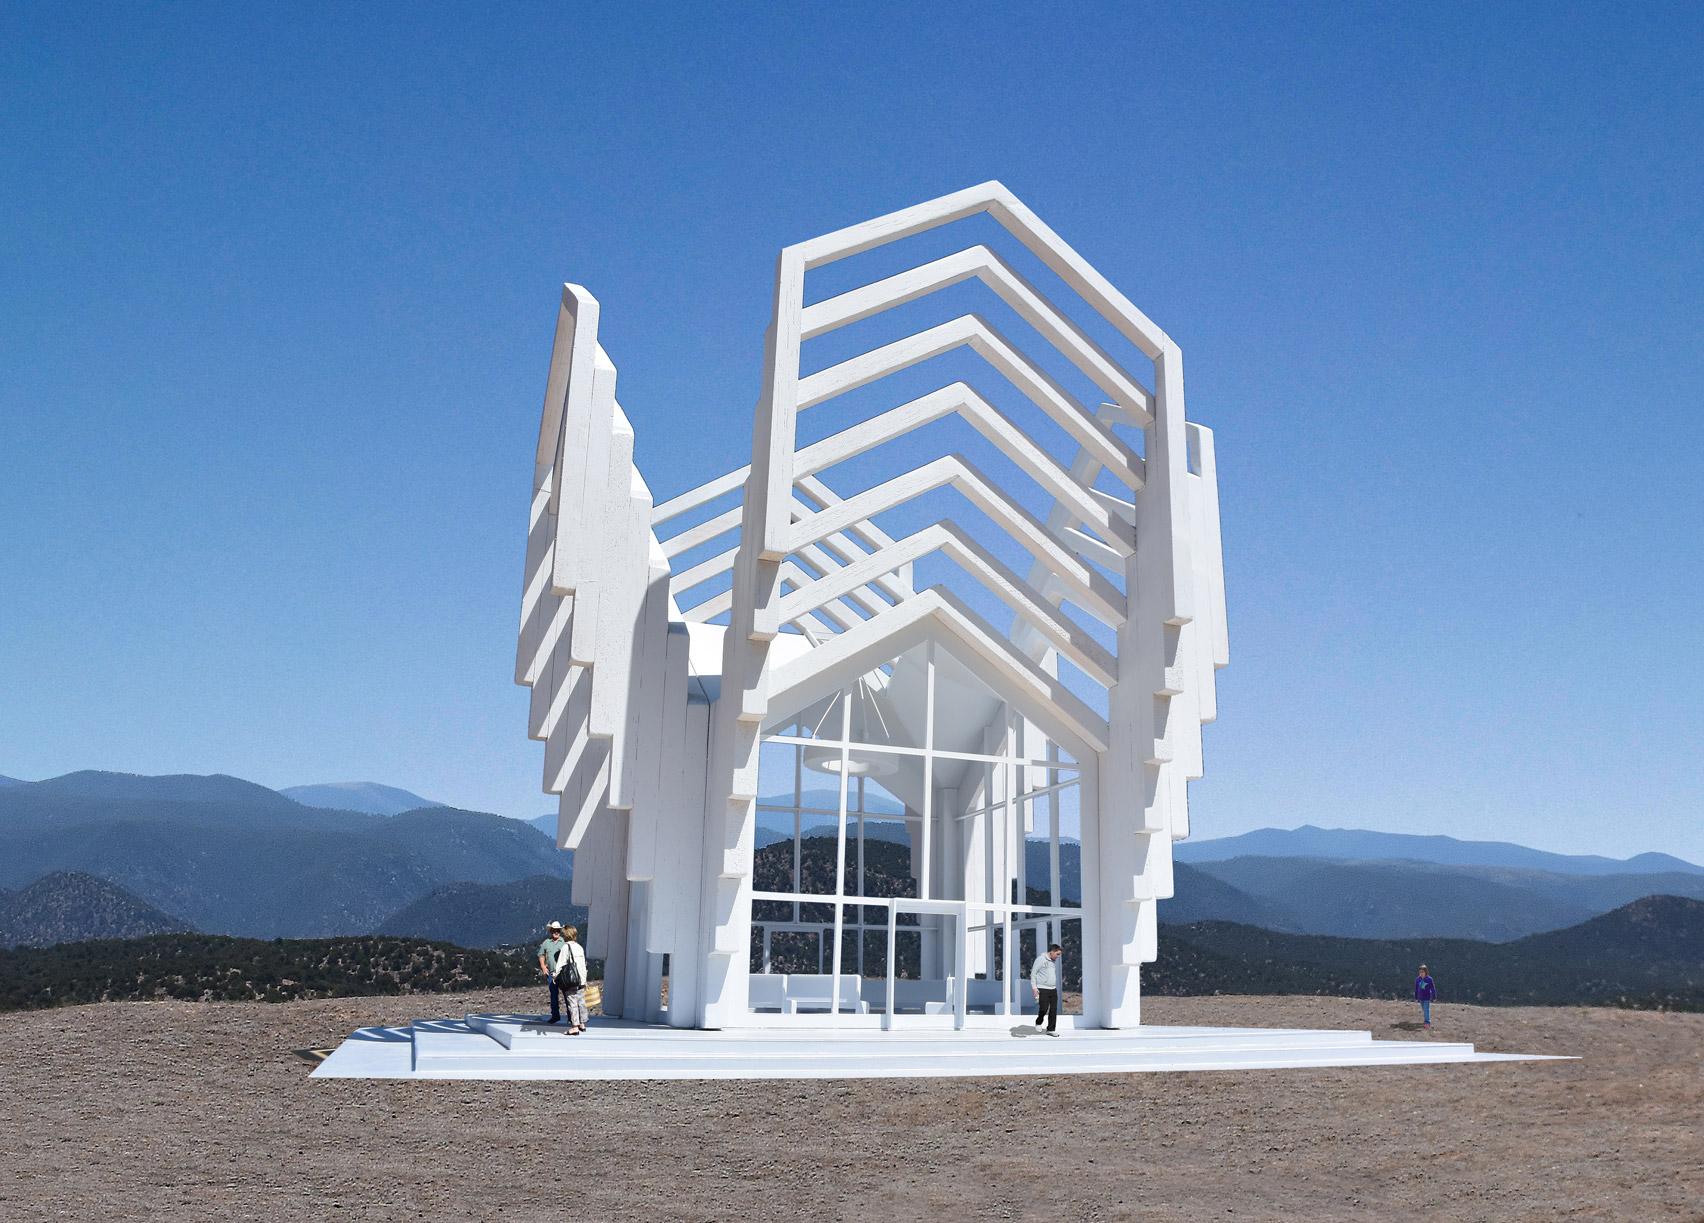 A Chapel for New Mexico by Michael Jantzen